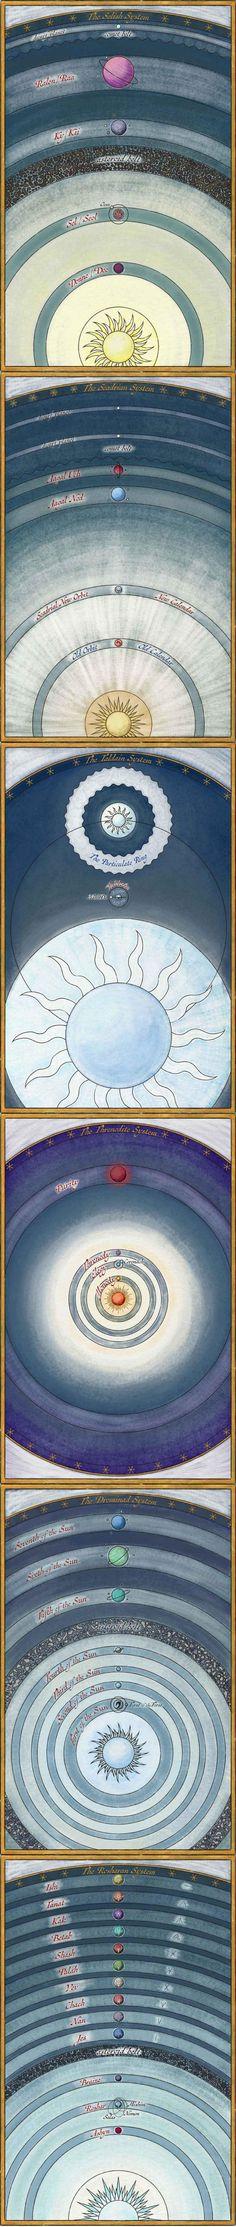 [Cosmere] Star Charts from Arcanum Unbounded: Selish, Scadrian, Taldain, Threnodite, Drominad, Rosharan System